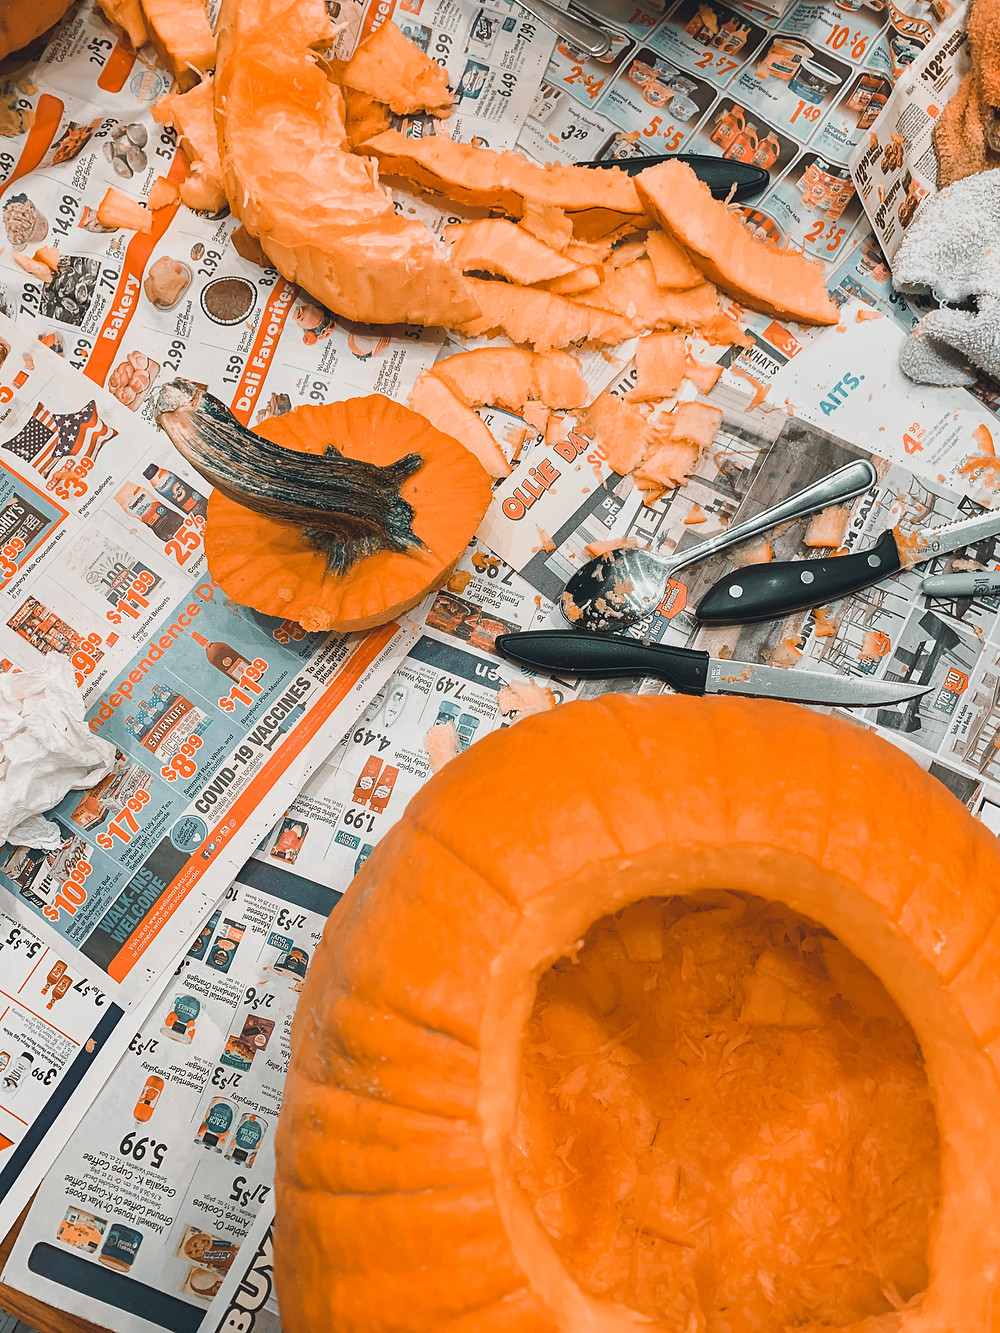 pumpkin carving newspaper orange pumpkin knives pumpkin stem